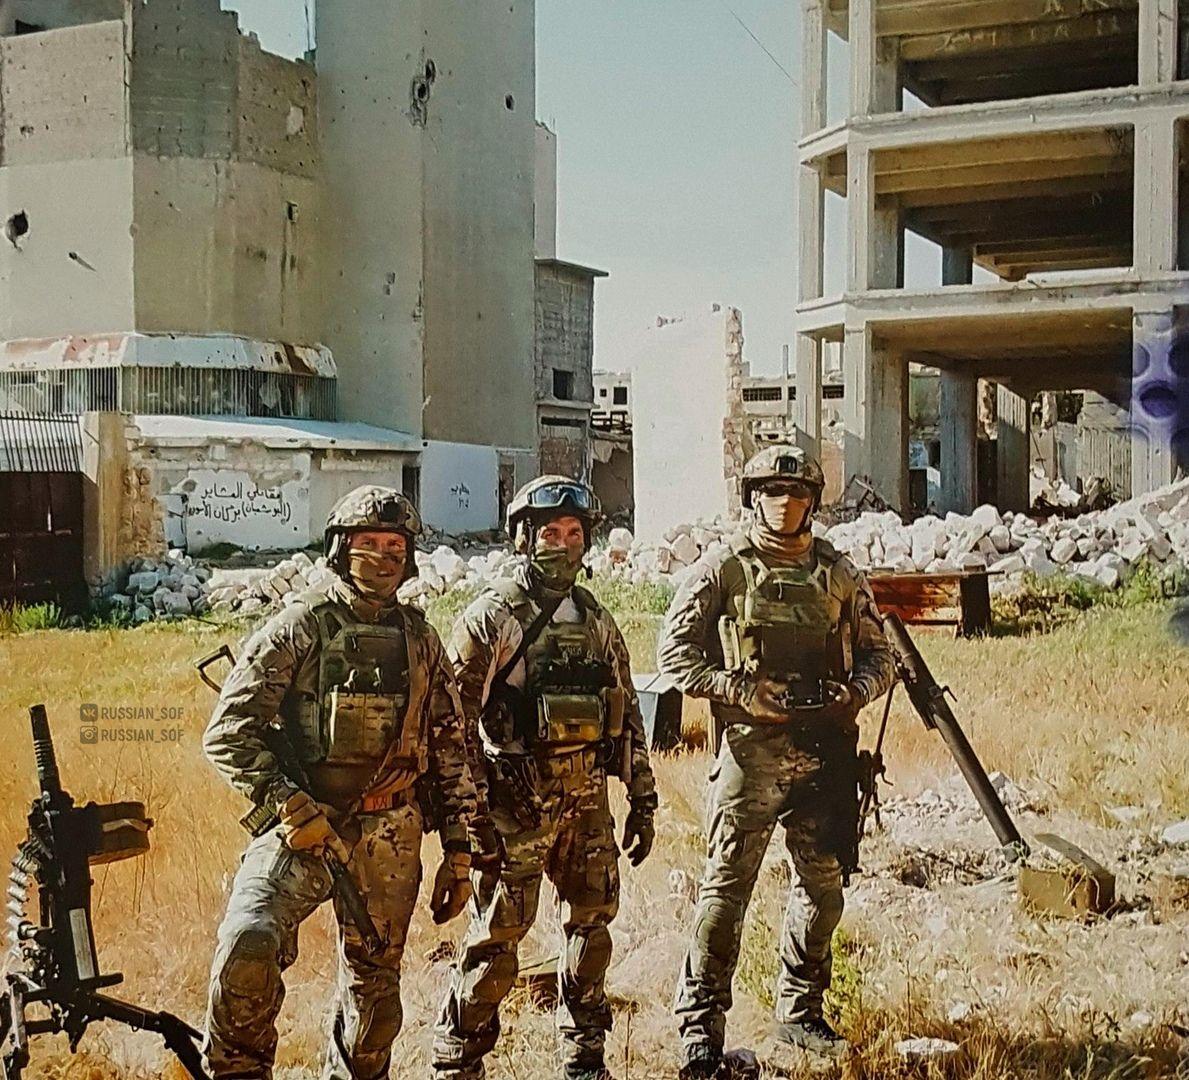 Spetsnaz/RUSSIAN SOF/FSB/Group K